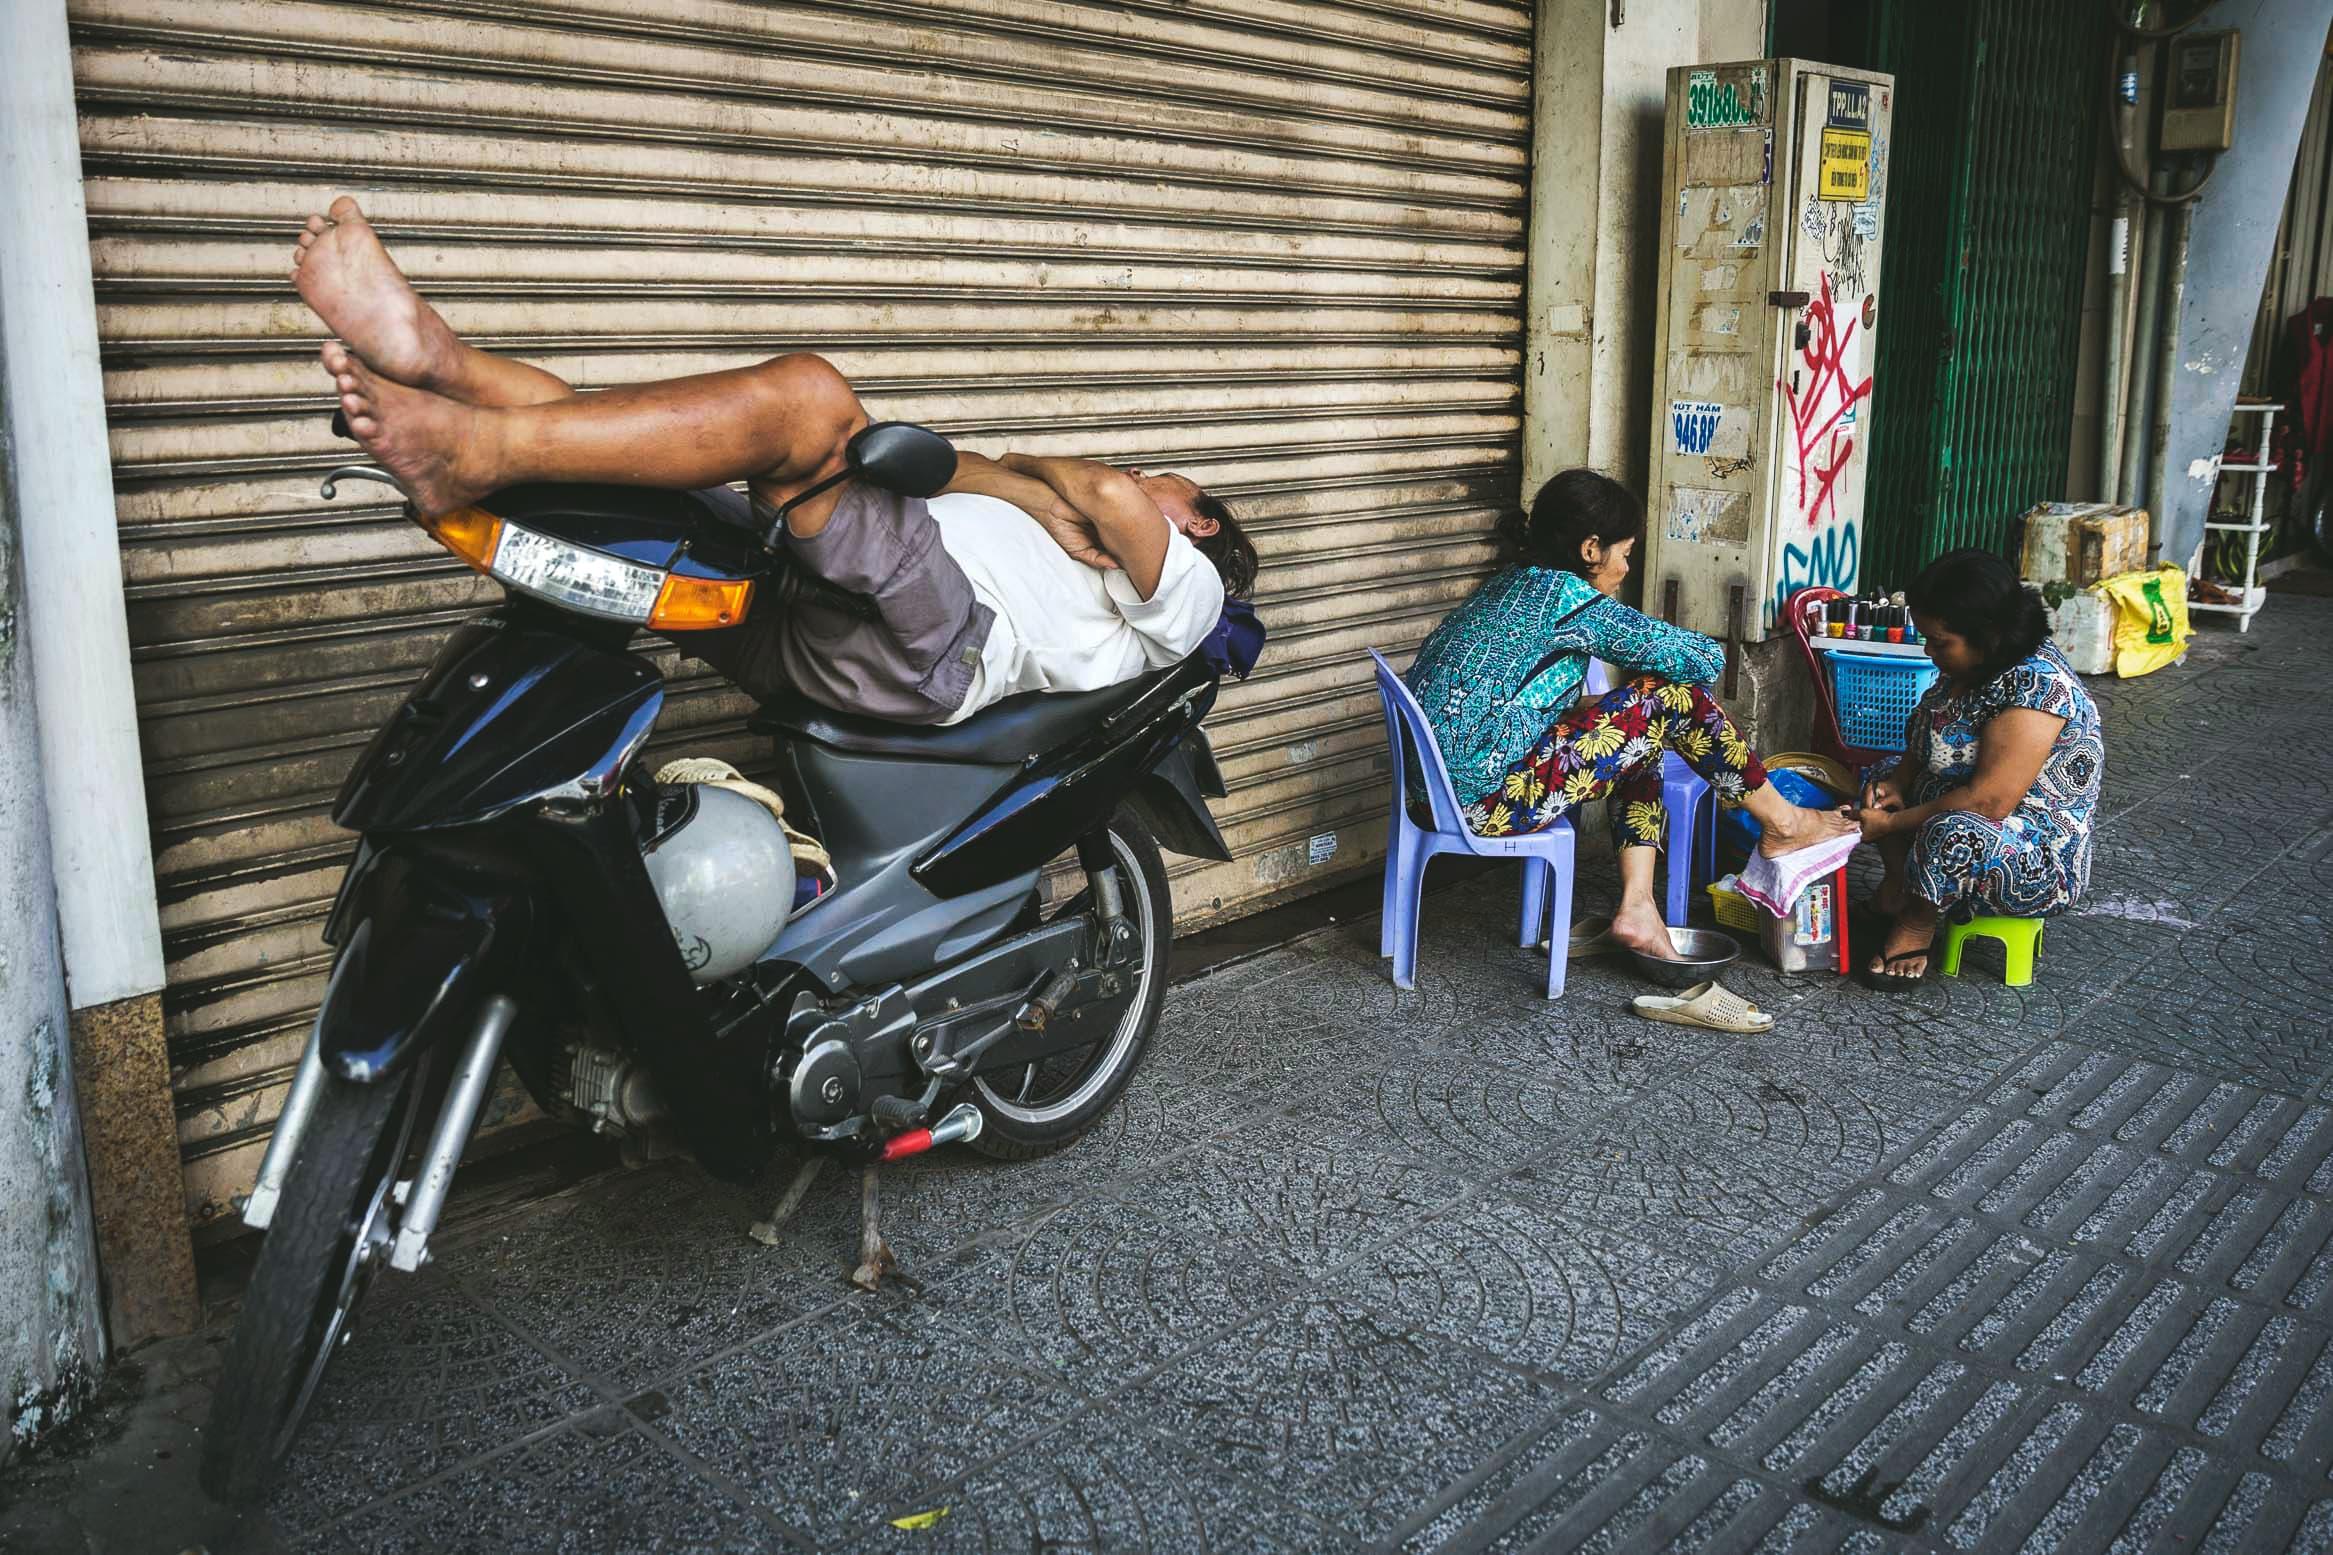 street-documentary-photography-fabio-burrelli-37.jpg